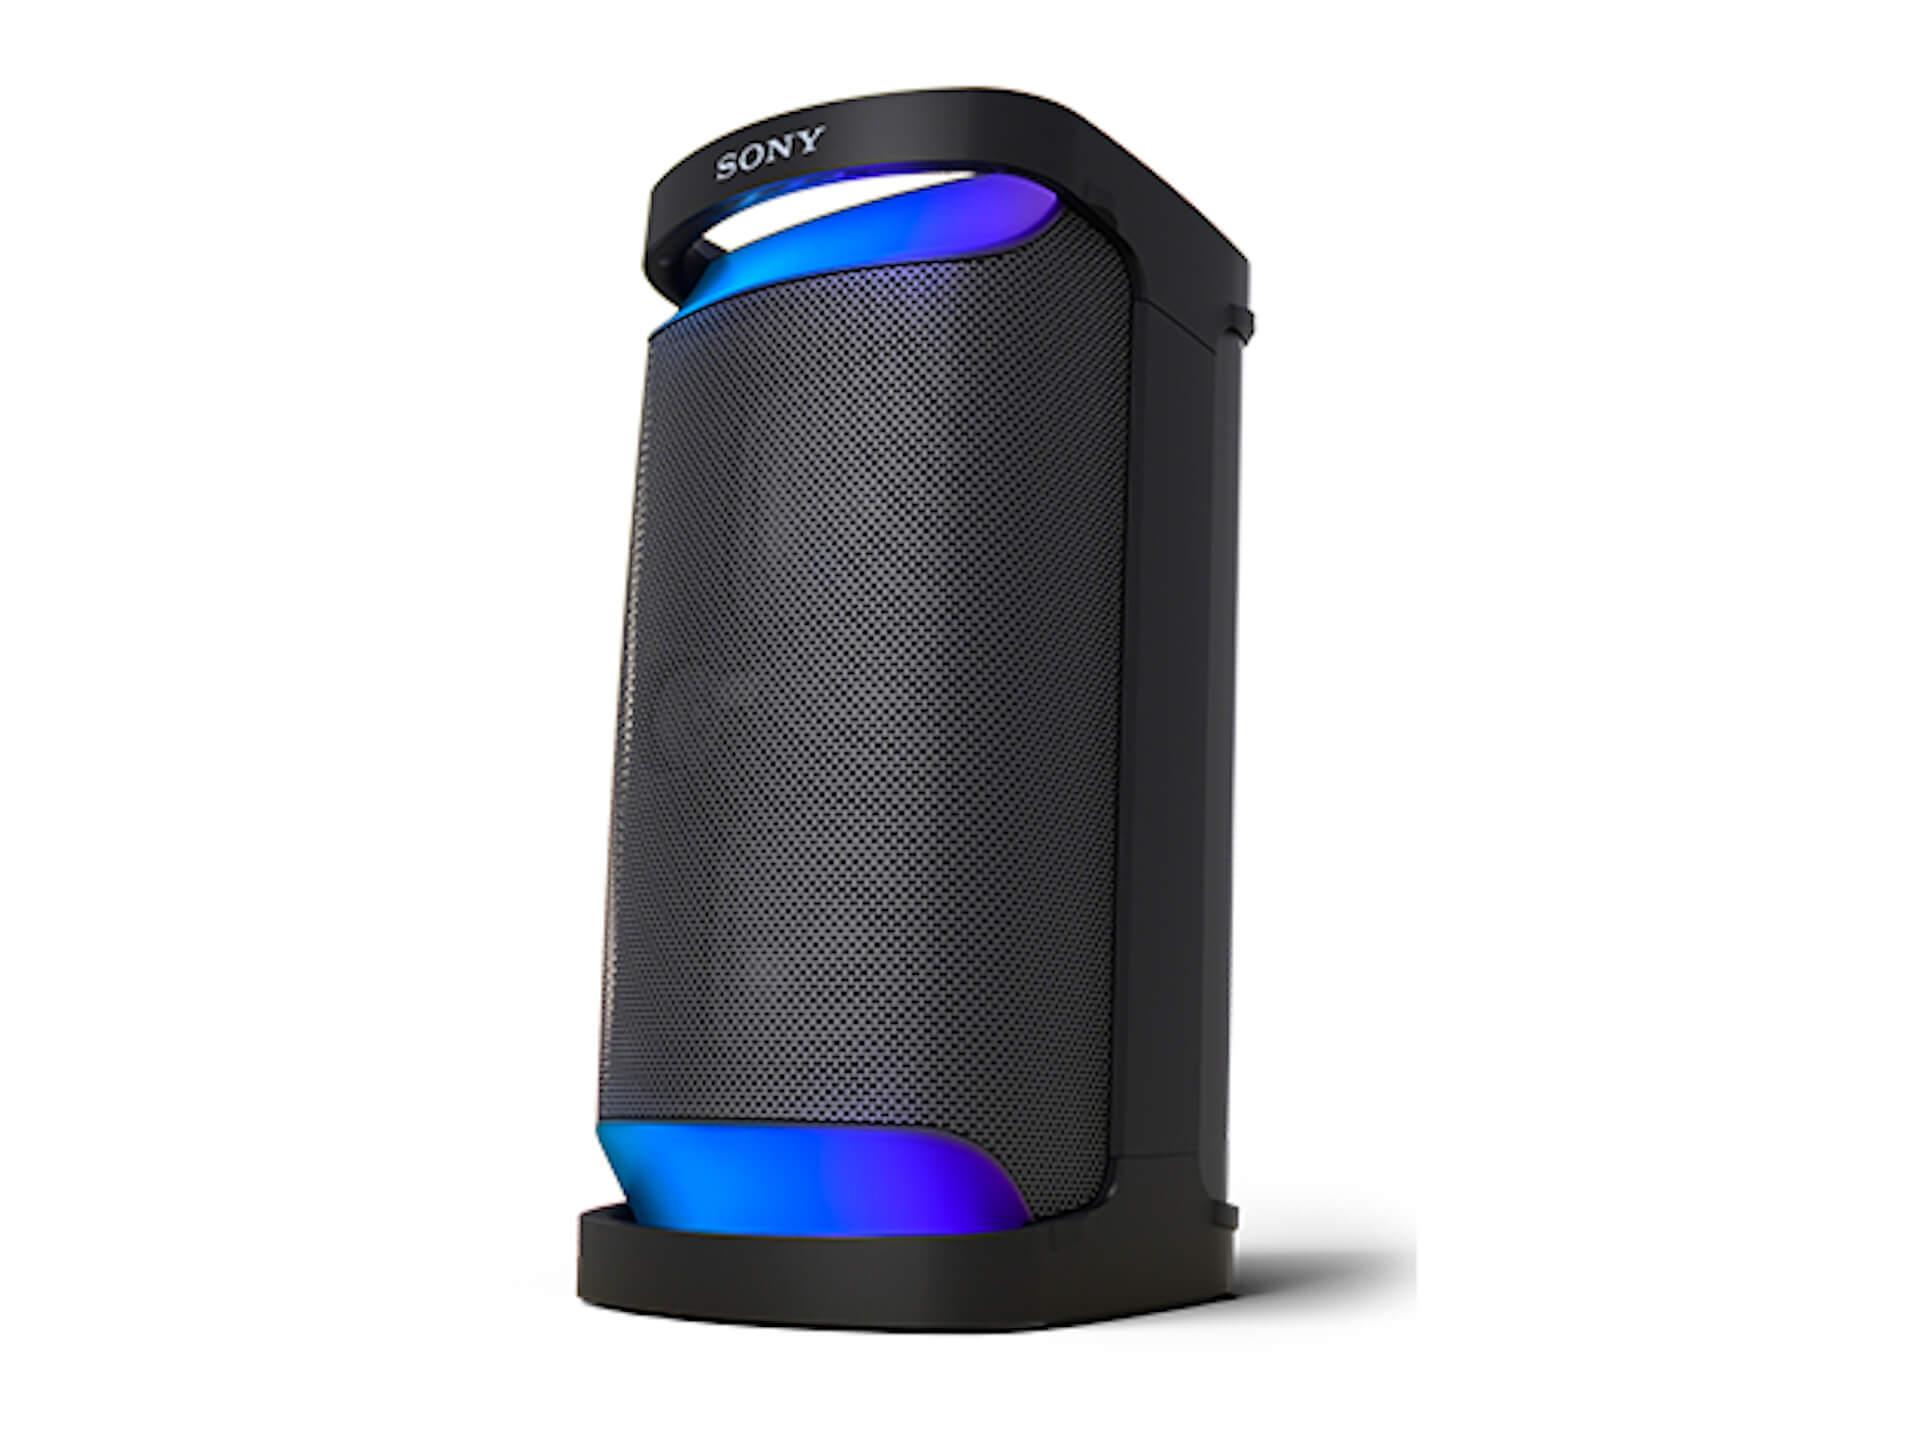 Sonyより最新鋭のワイヤレスポータブルスピーカー3機種が登場!大音圧で高音質と重低音を楽しめるXシリーズ発表 tech210427_sony-210427_2